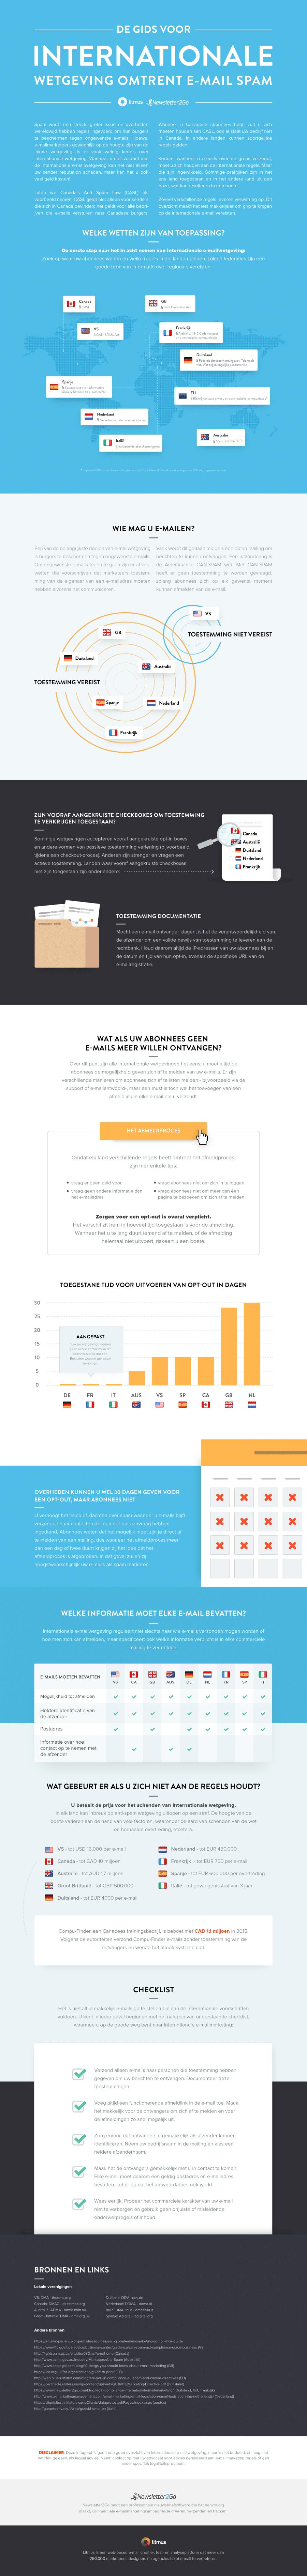 gids internationale e-mailwetgeving